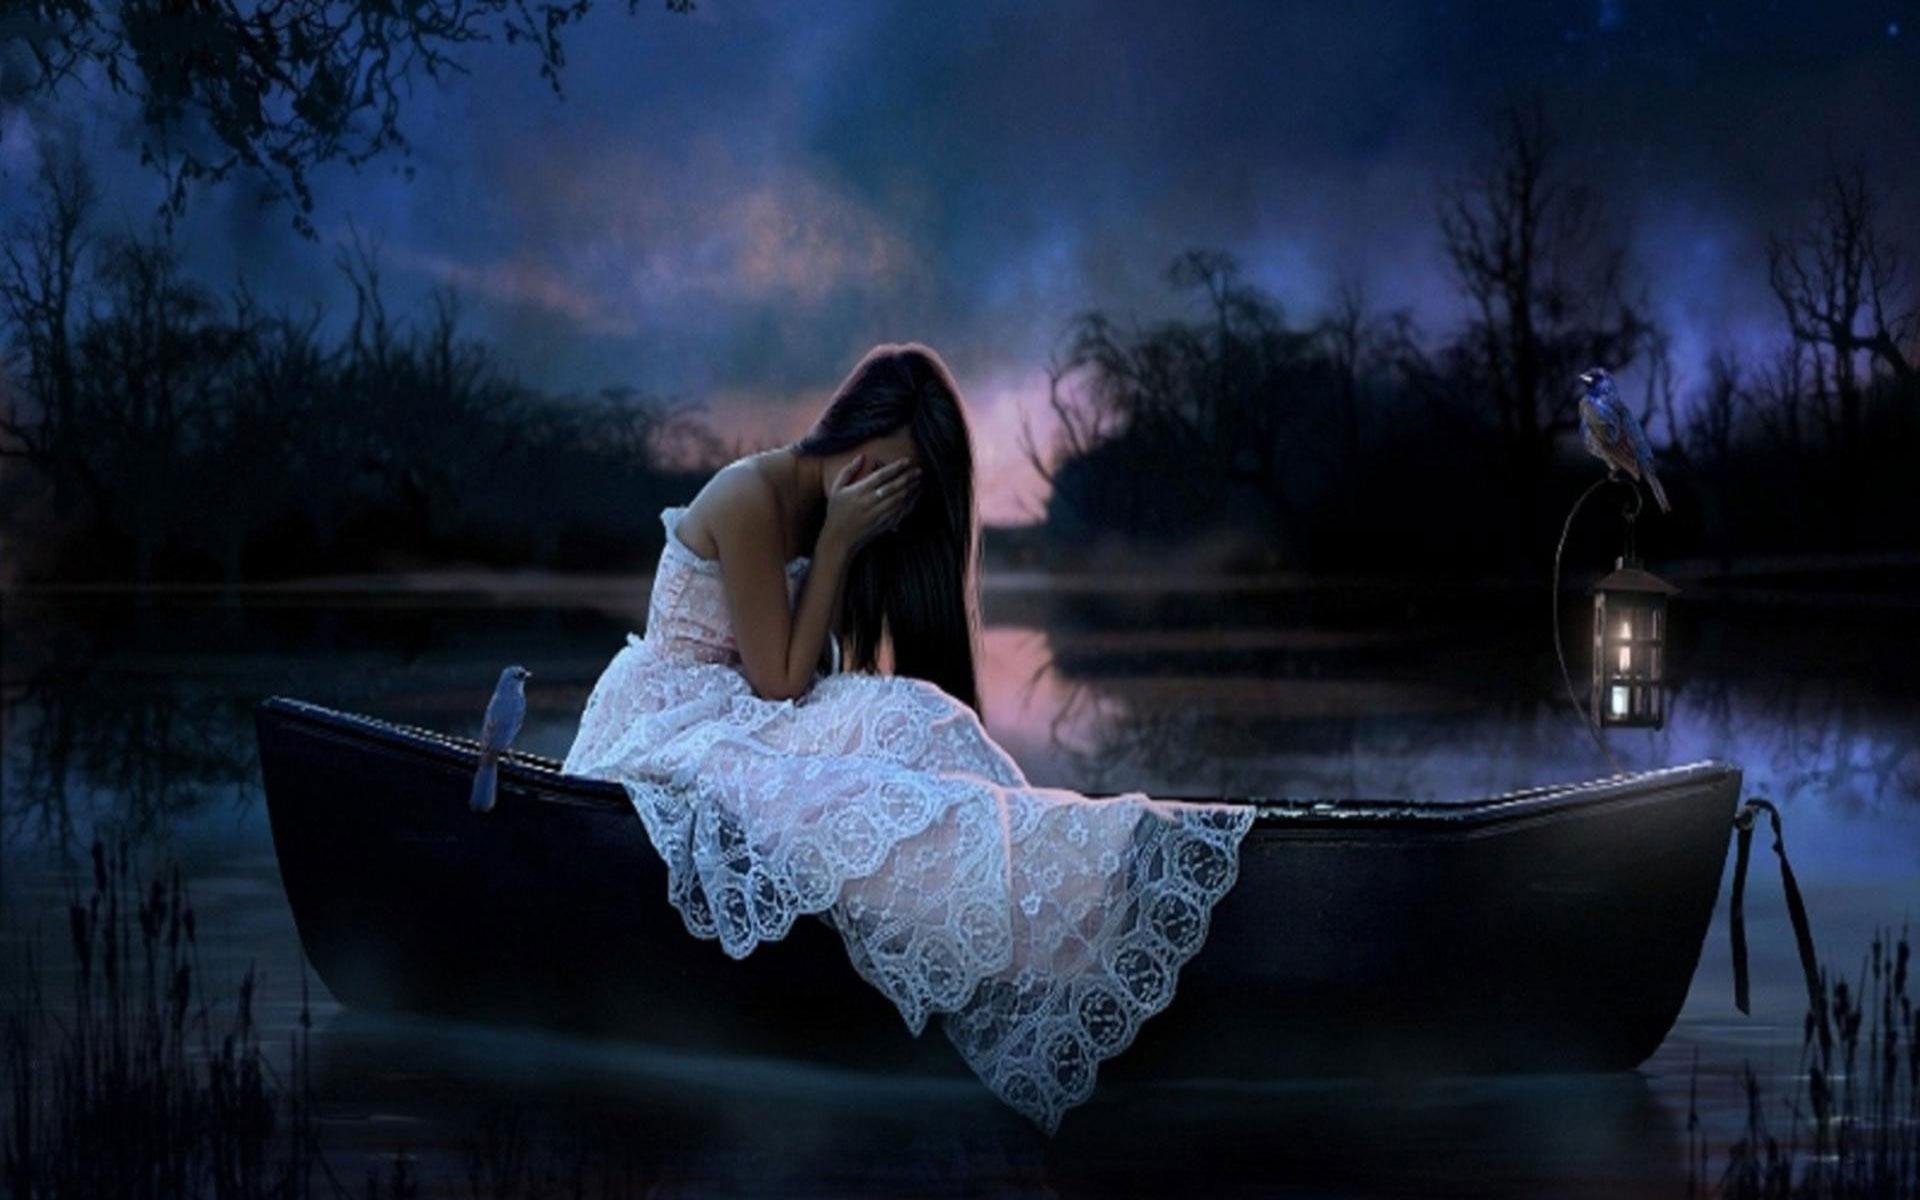 Alone Crying Girl Hd Wallpaper Sad Wallpapers Hd Pixelstalk Net